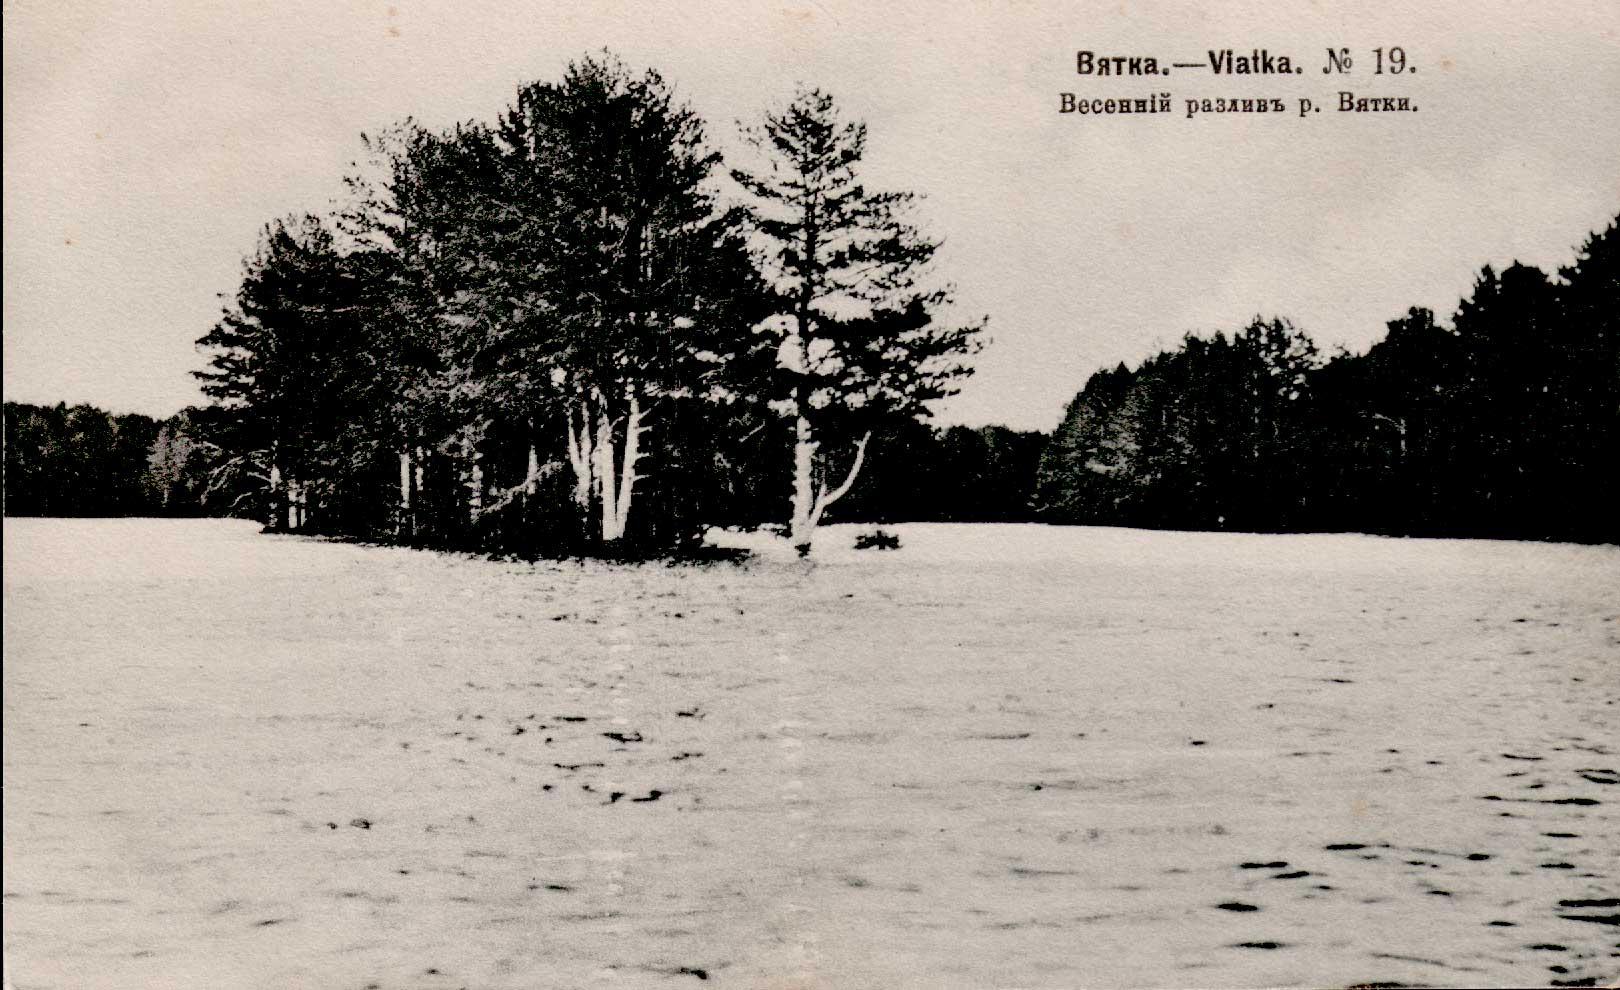 Окрестности Вятки. Весенний разлив реки Вятки